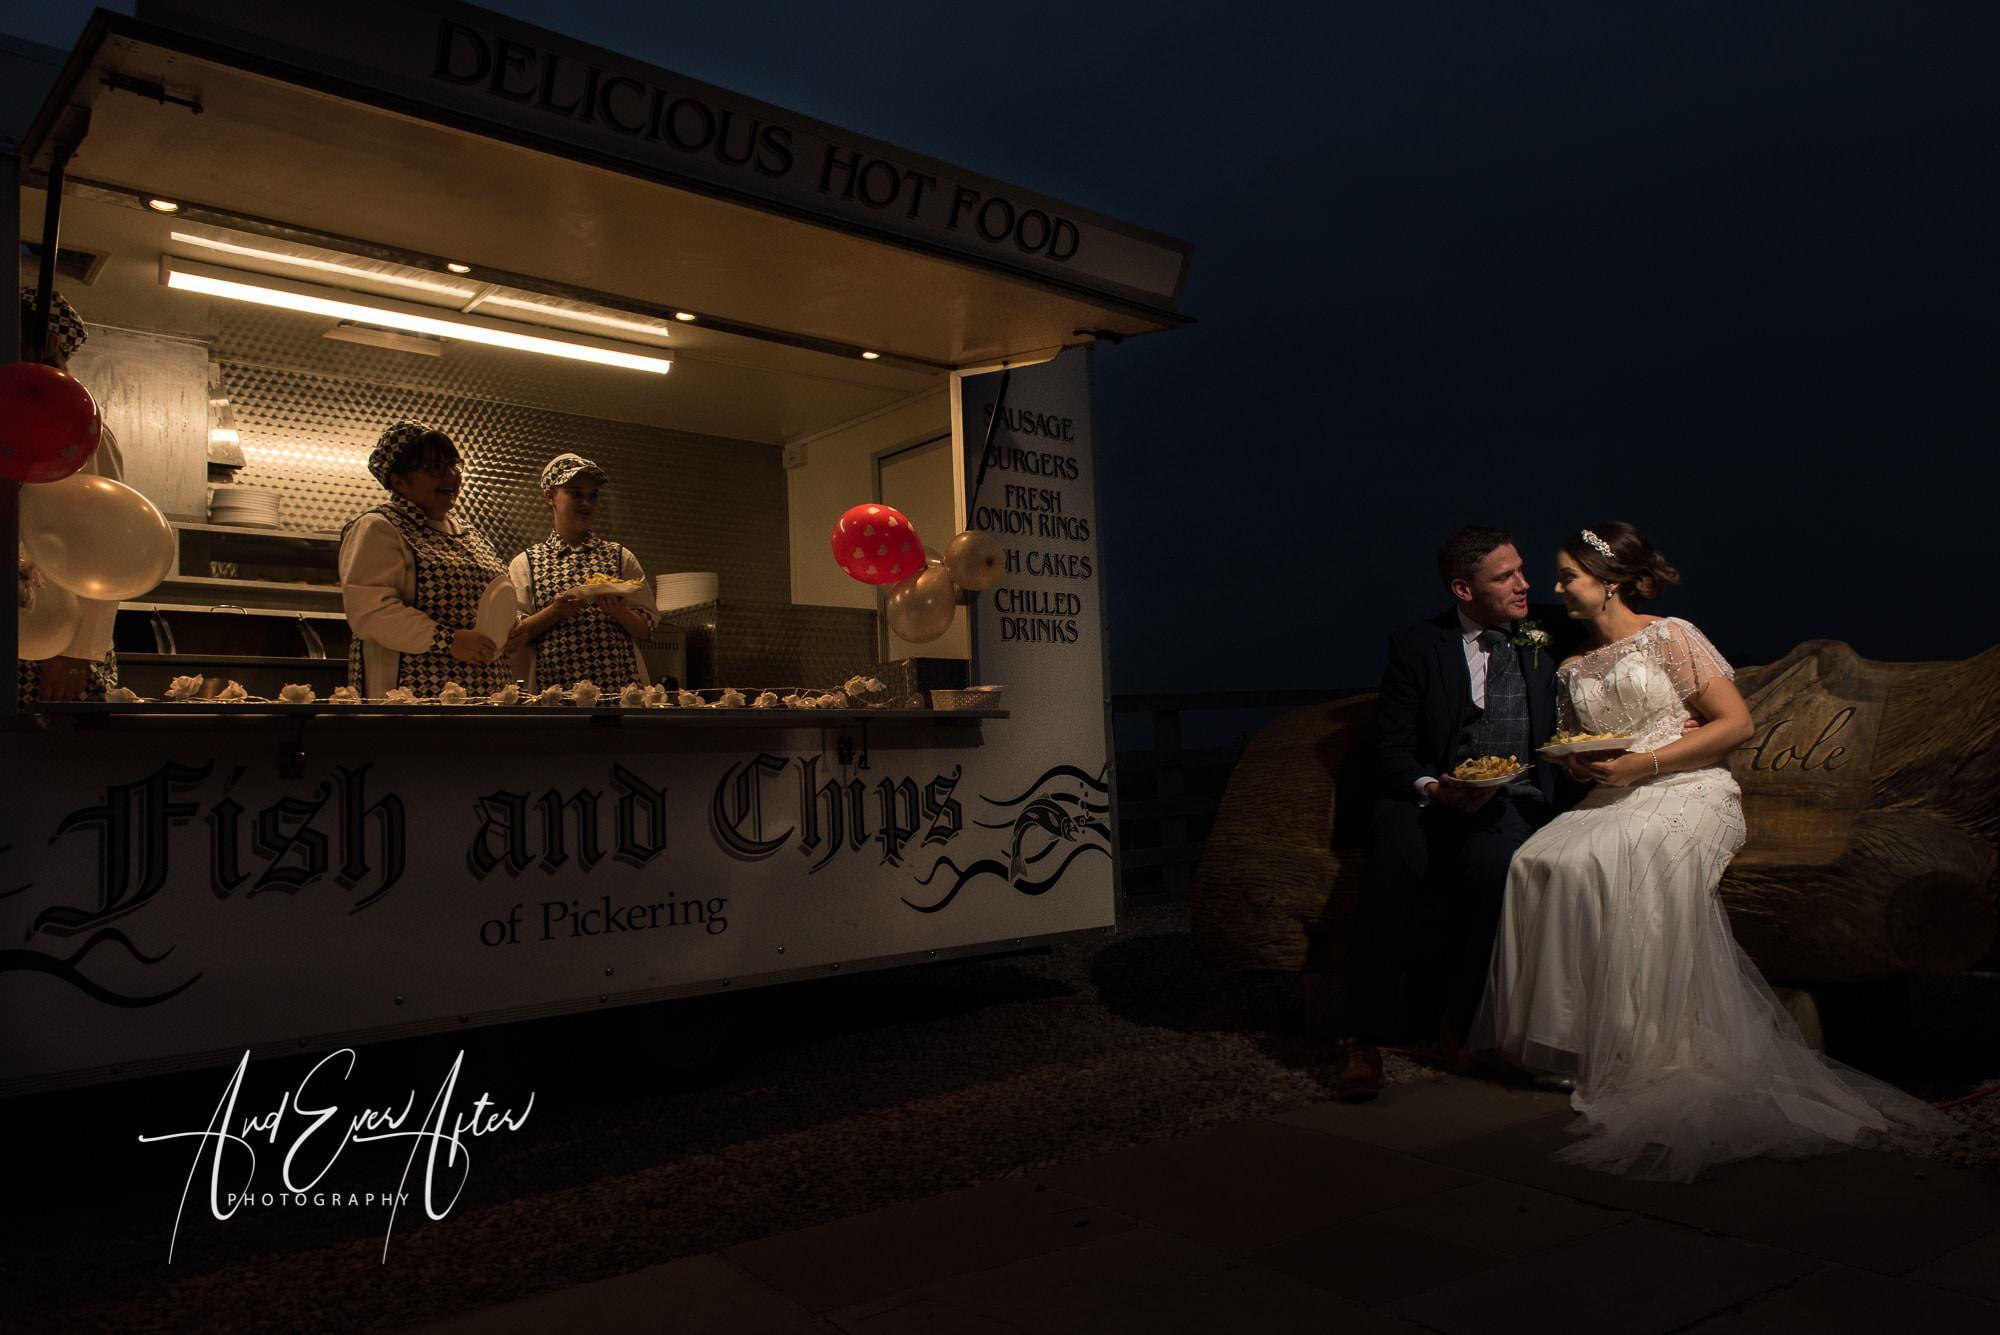 bride, groom, wedding day, love, wedding portrait